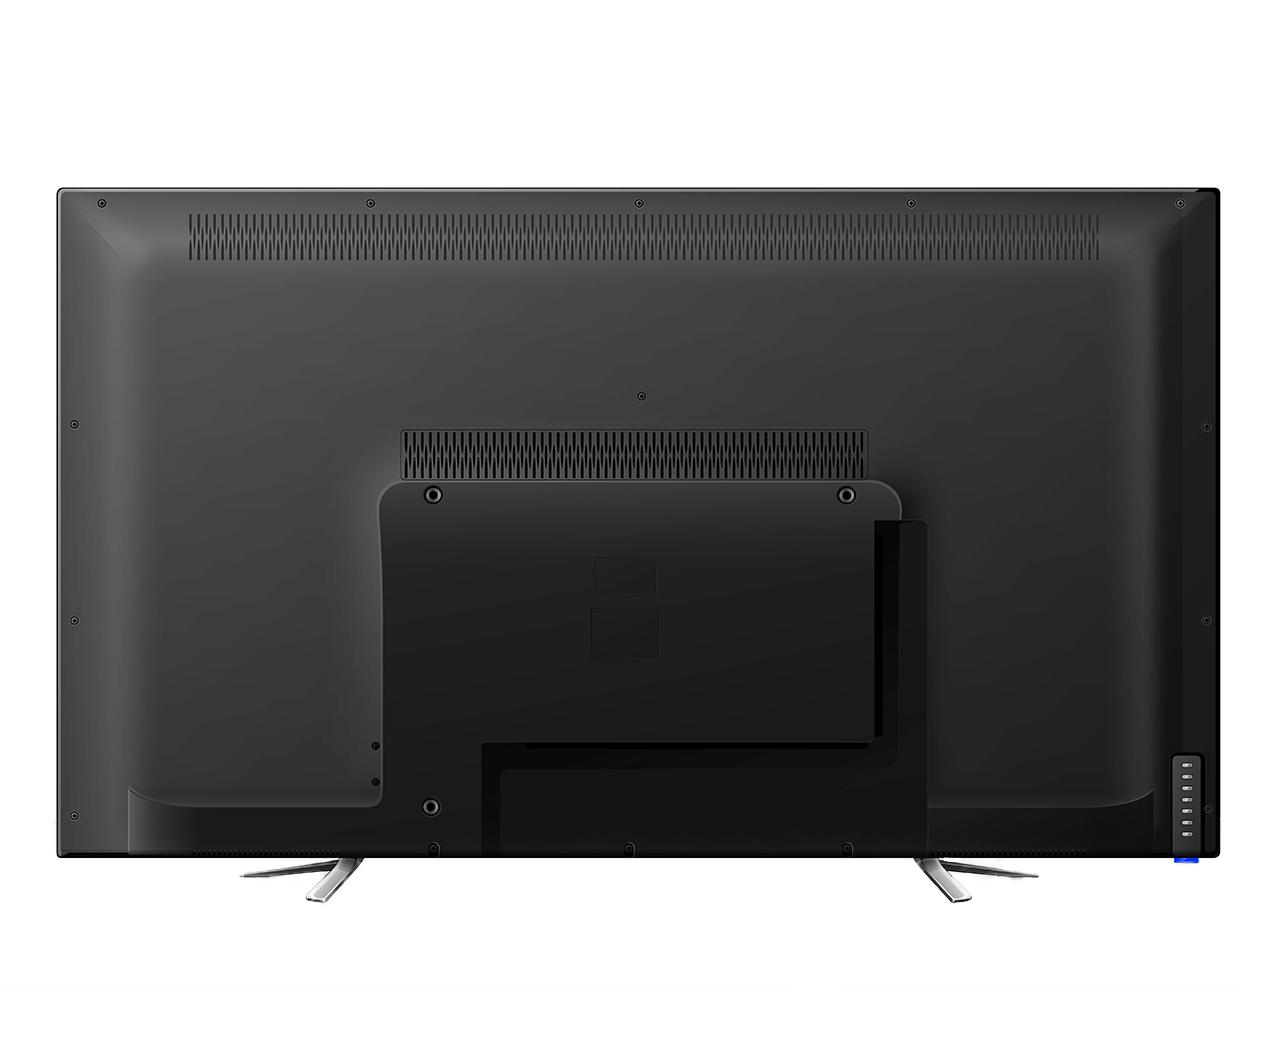 50V型 デジタルフルハイビジョン Wチューナー液晶テレビ